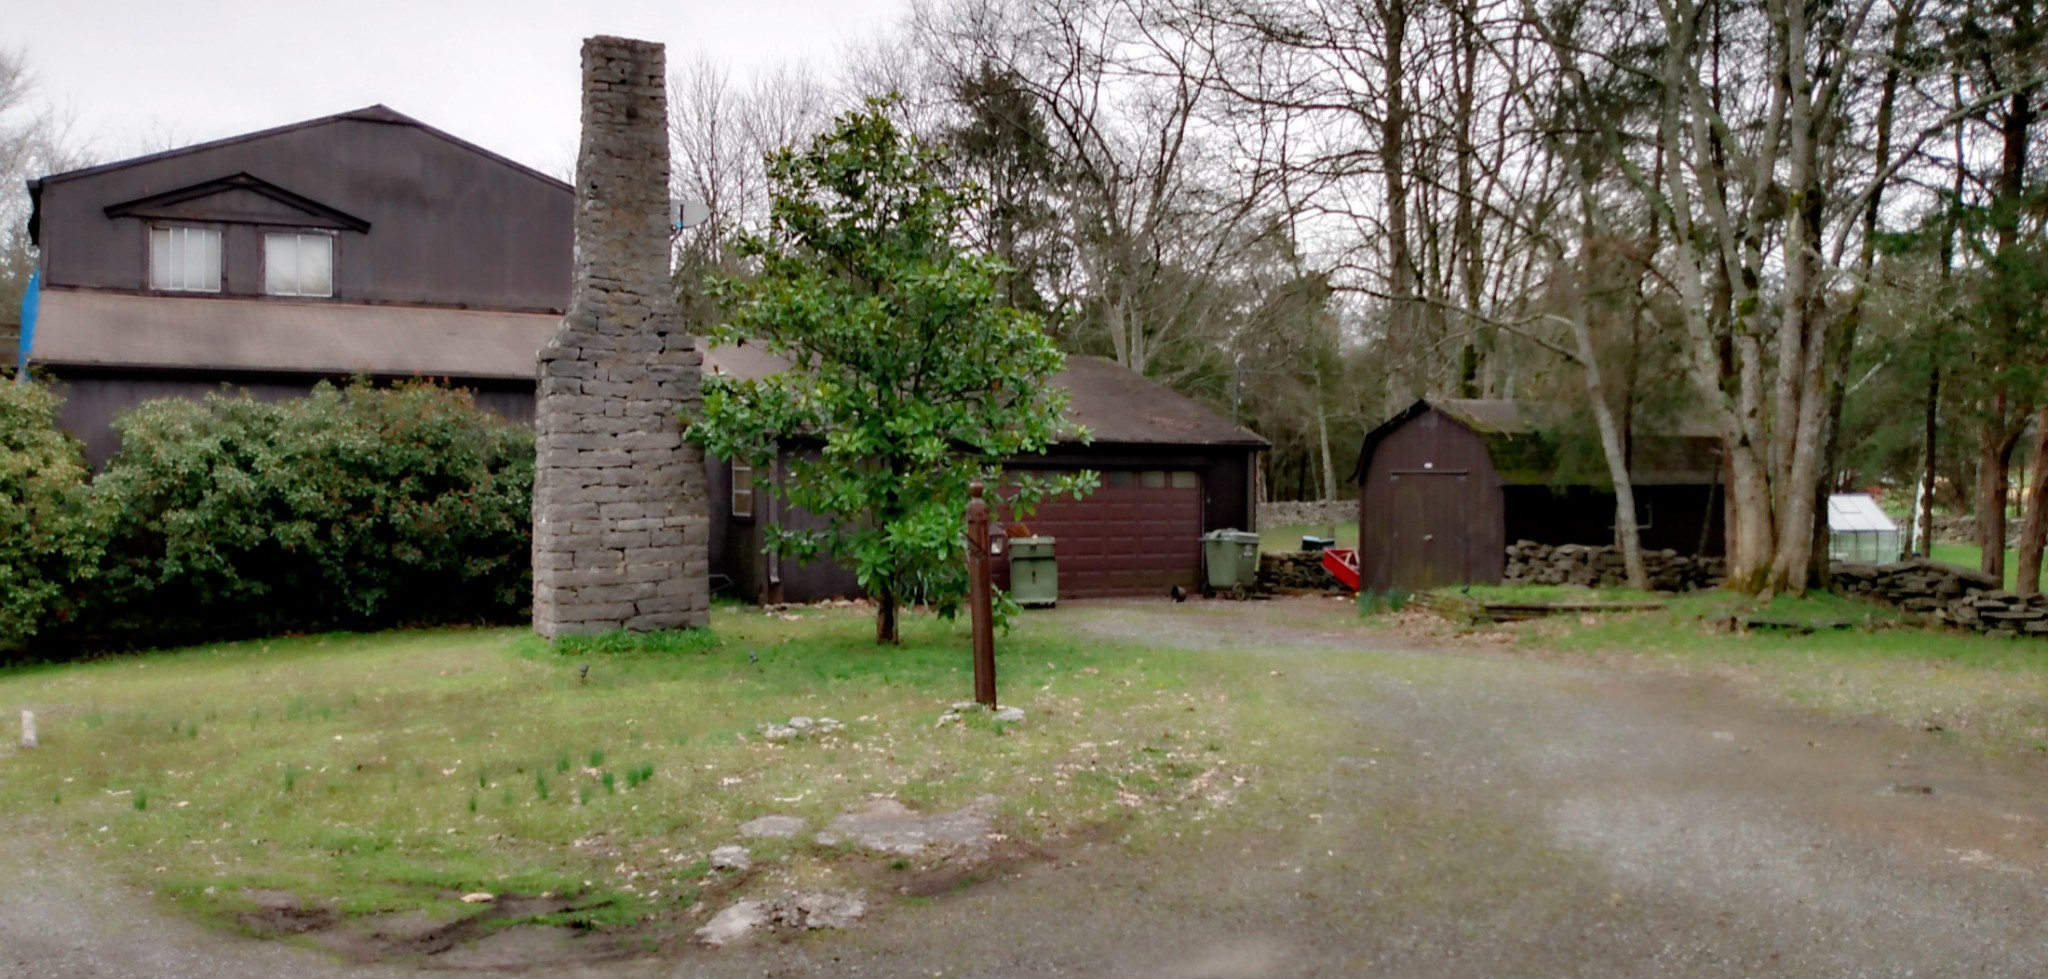 2920 Bivens Hill Rd, Readyville, TN 37149 - Readyville, TN real estate listing